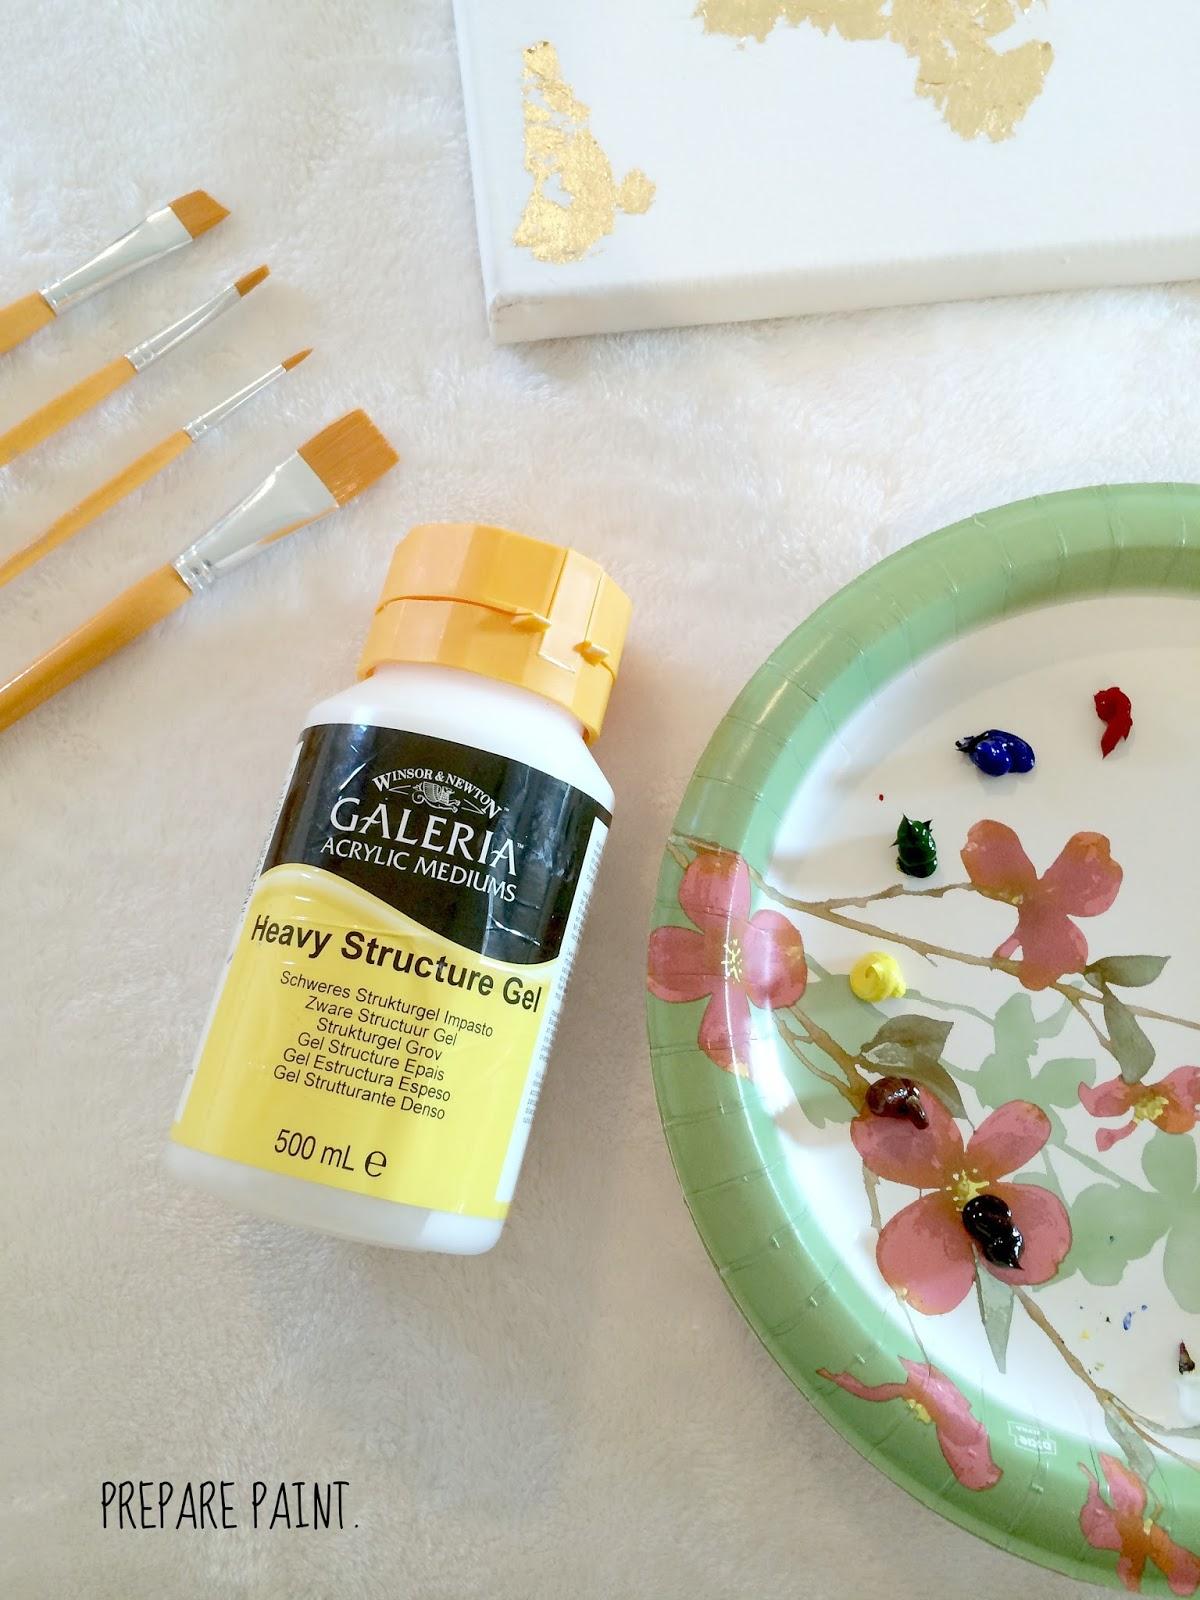 How To Make DIY Gold Leaf Abstract Art | LiveLoveDIY ... - photo #25